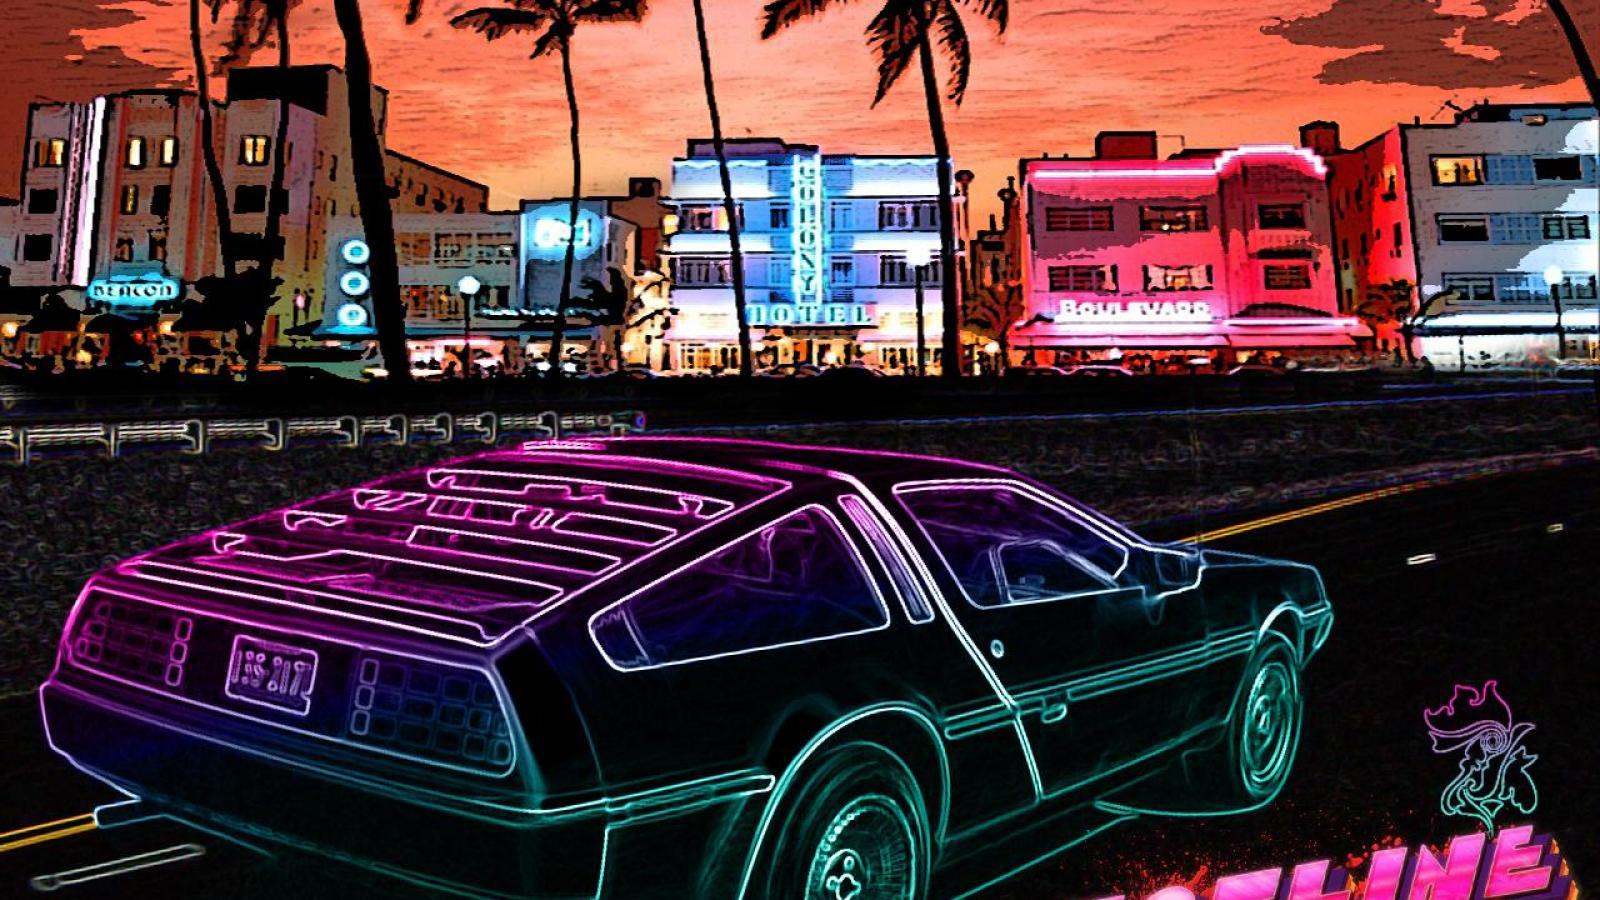 Hotline Miami Wallpaper by Protski - WallpaperSafari